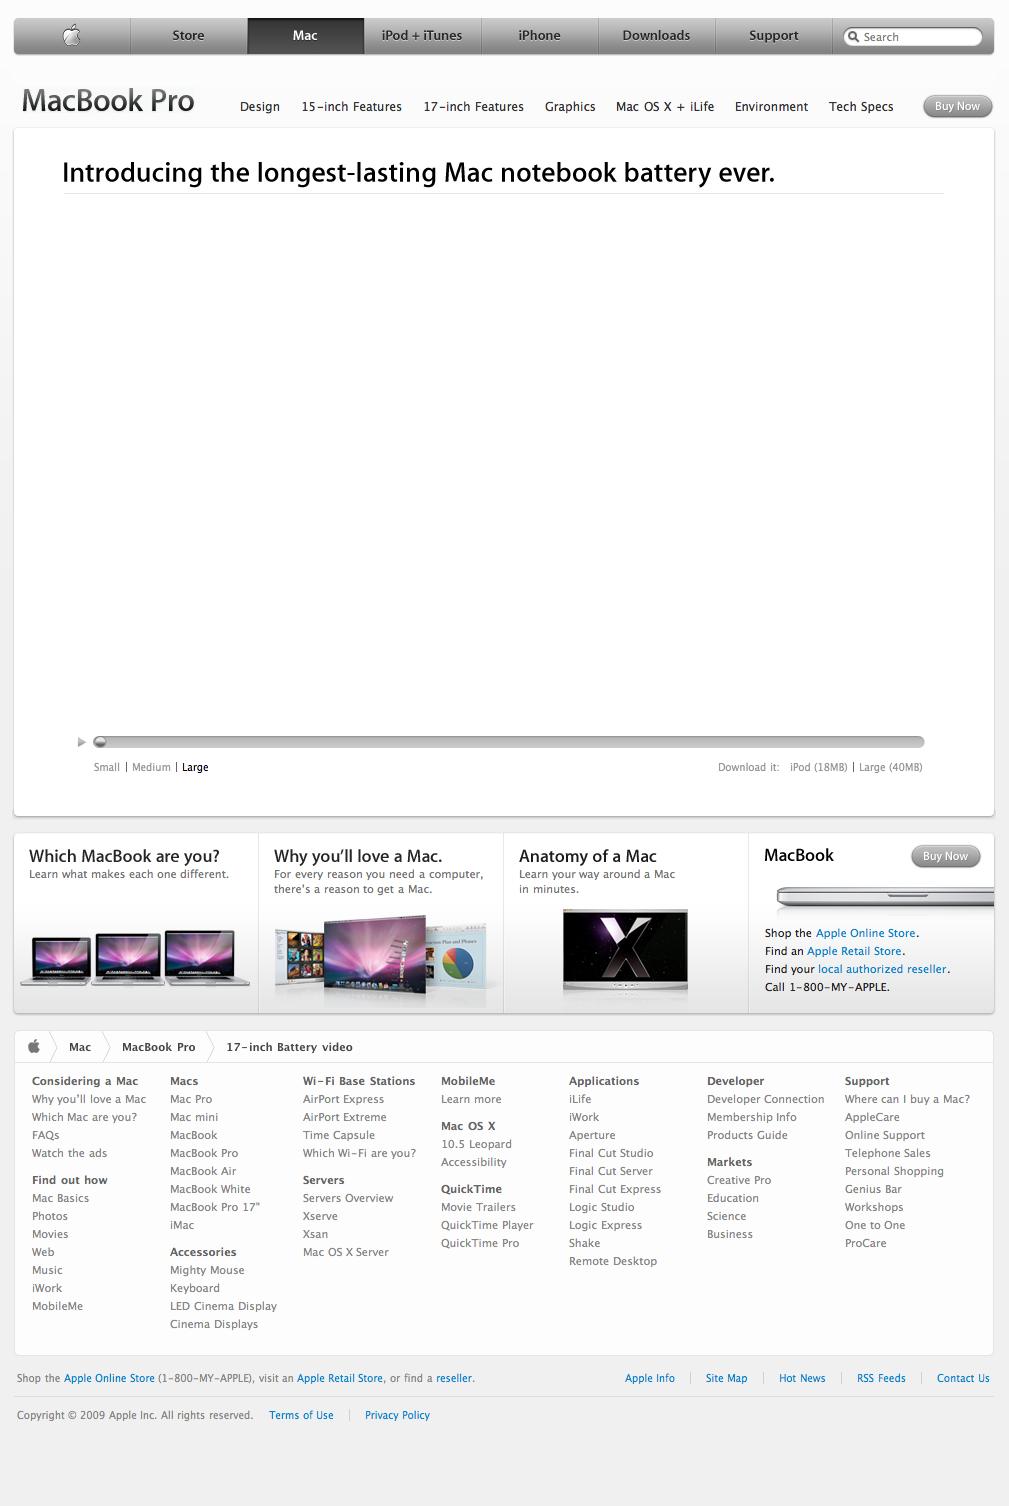 Apple - MacBook Pro - 17-inch Battery Video (07 01 2009